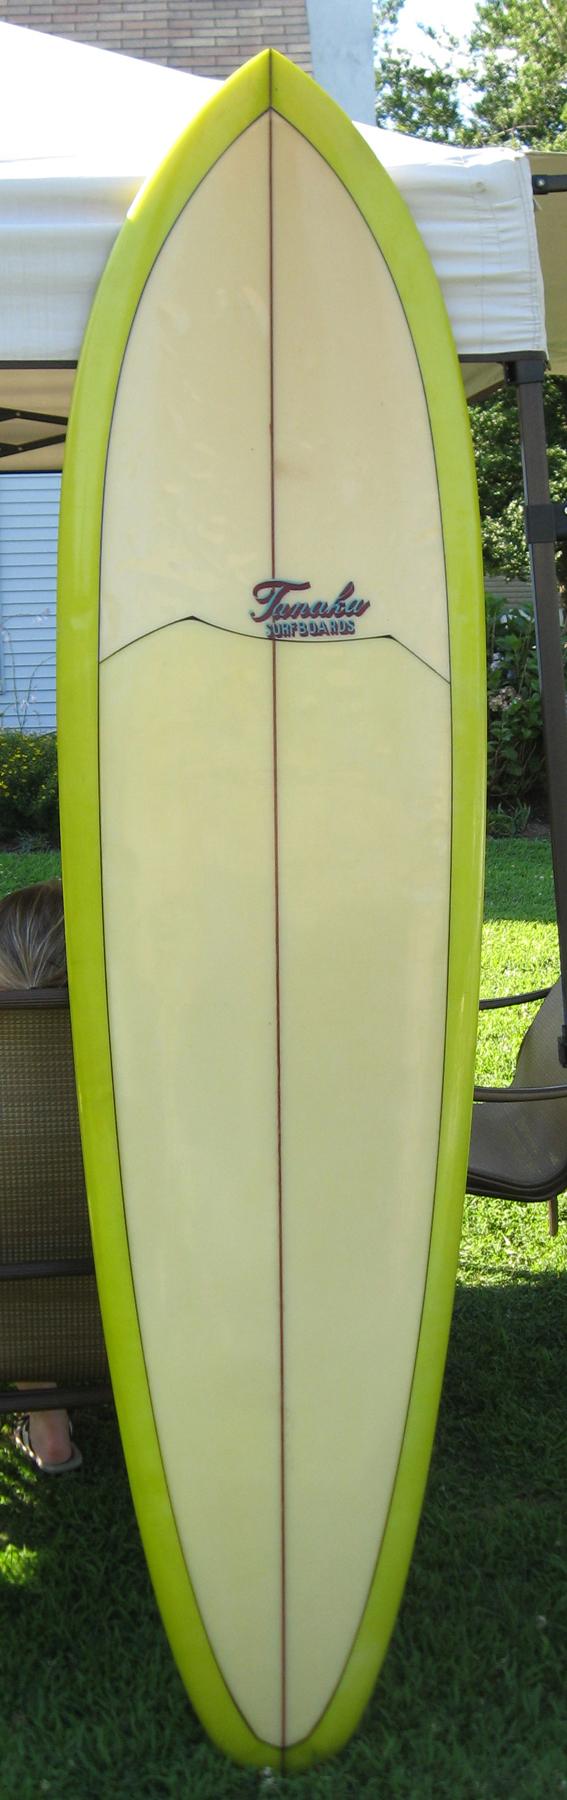 Ernie tanaka surfboard